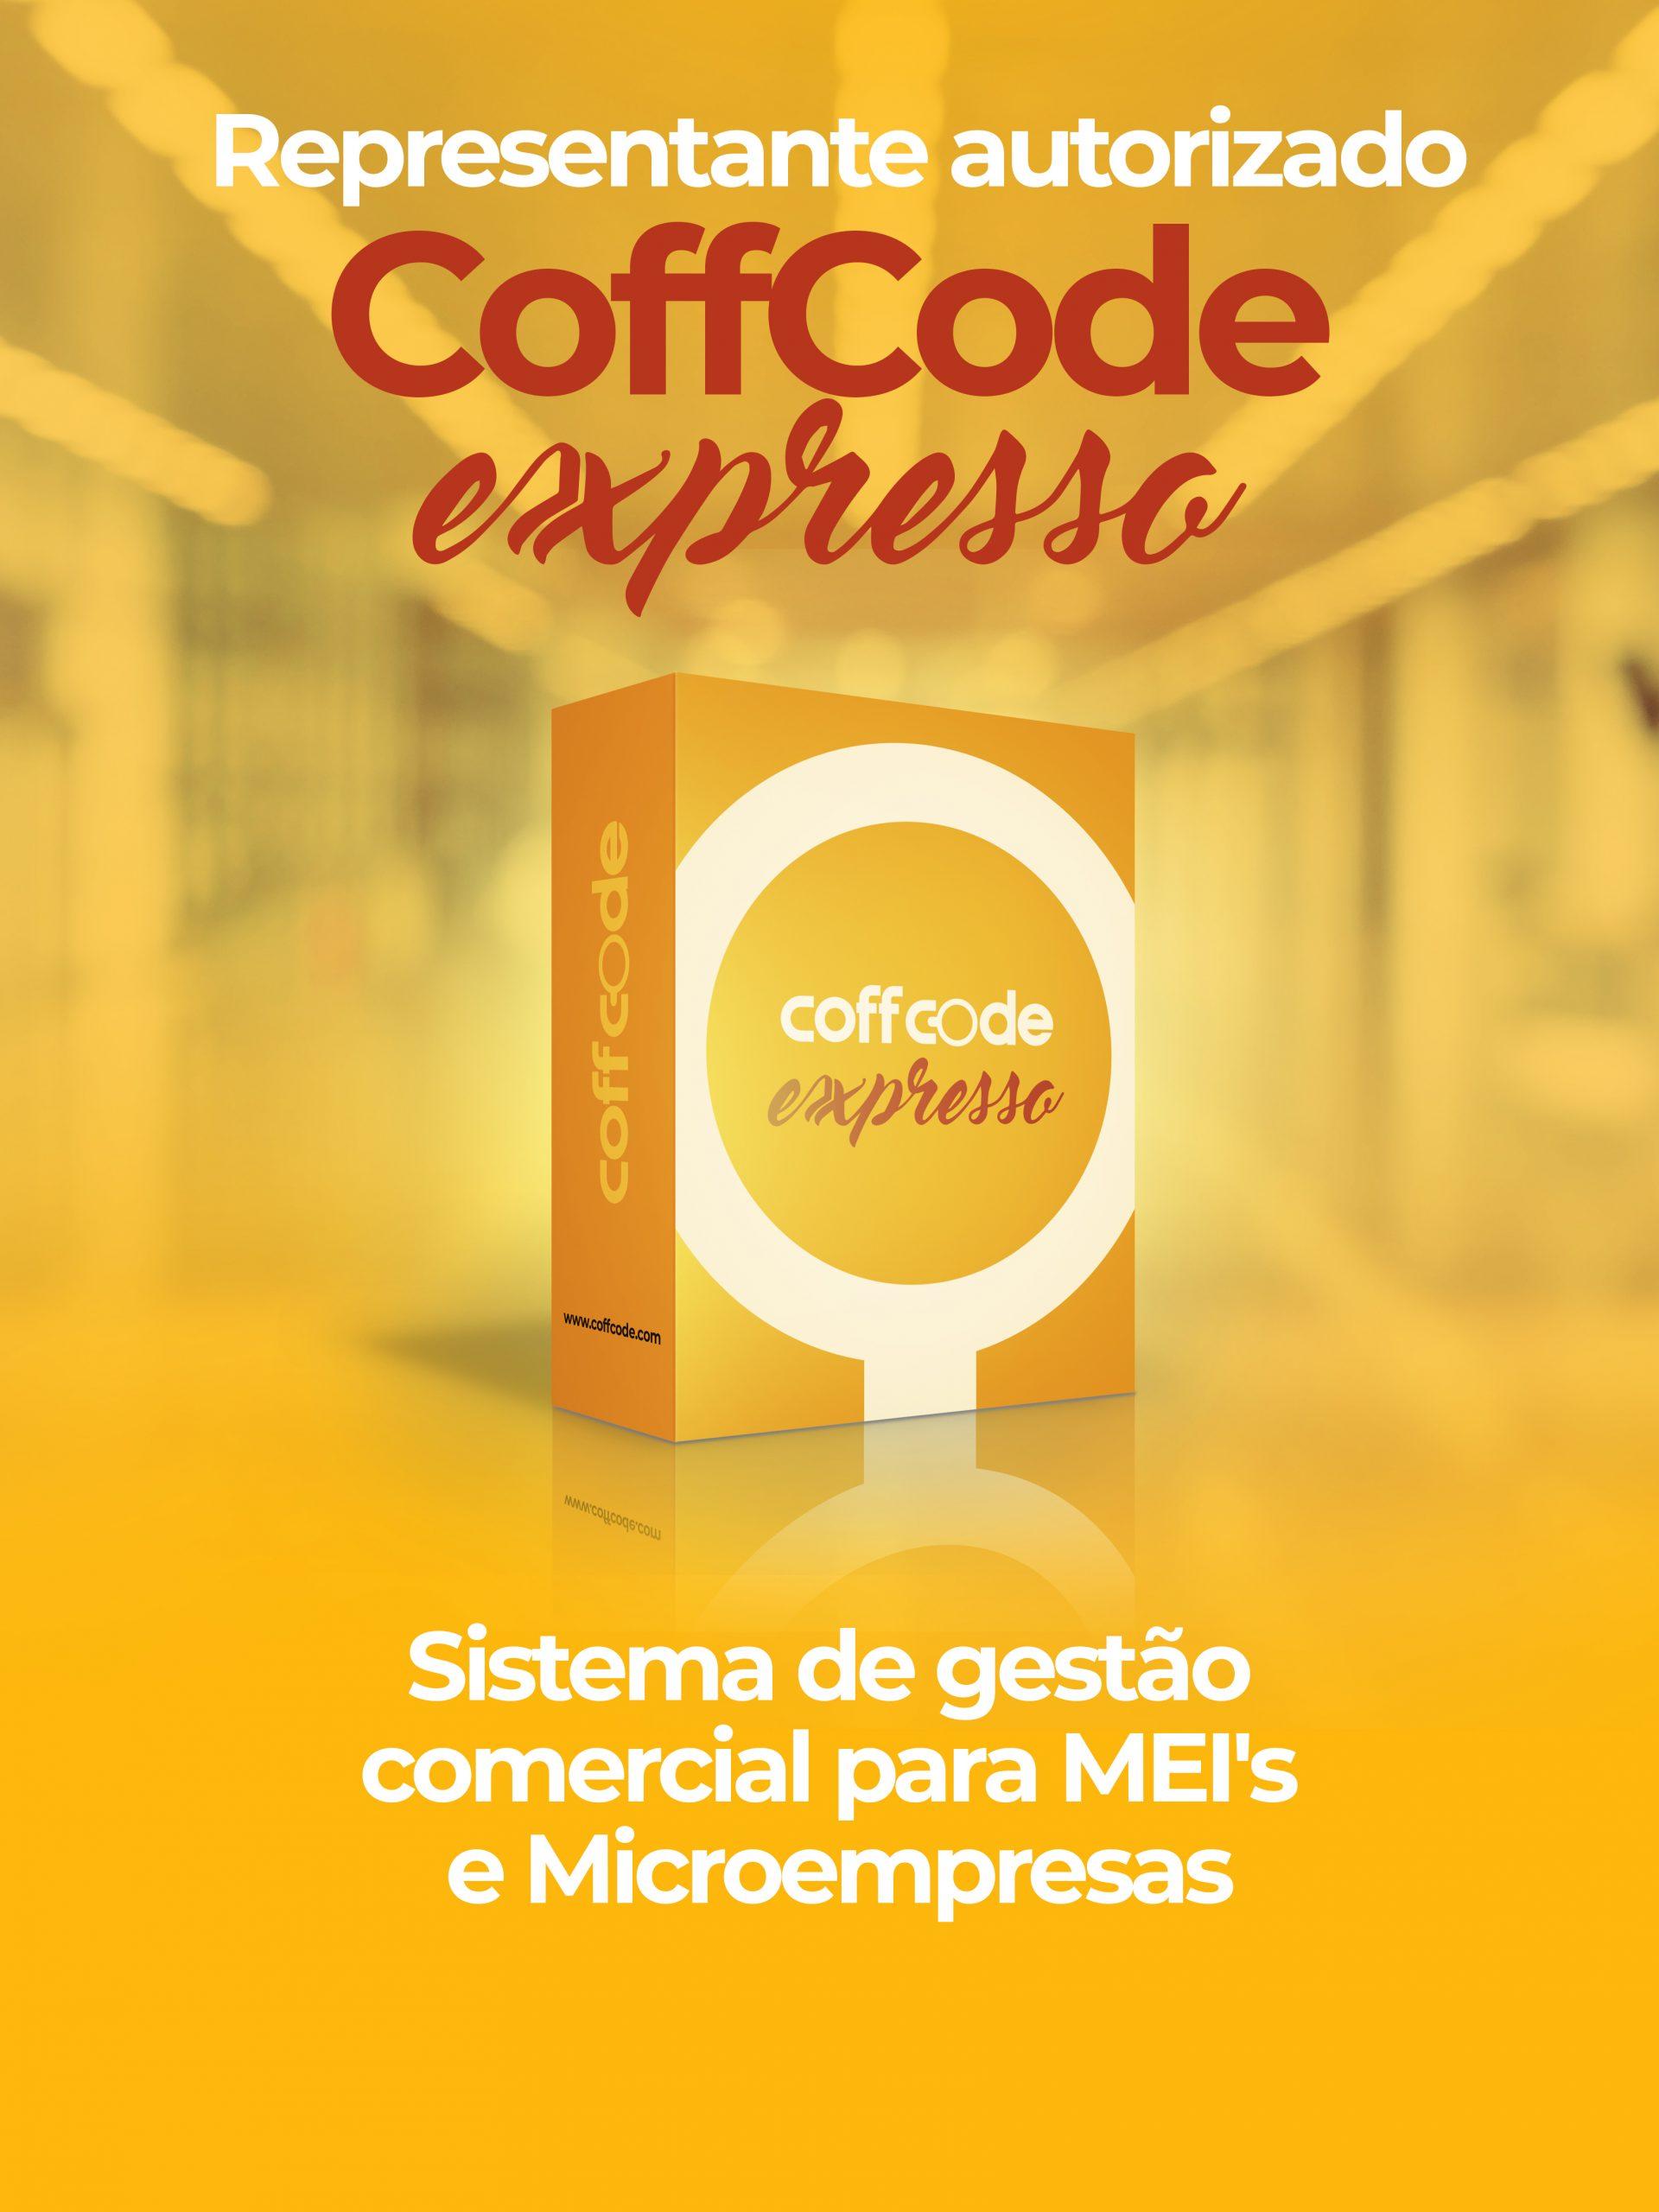 Somos Representantes da CoffCode